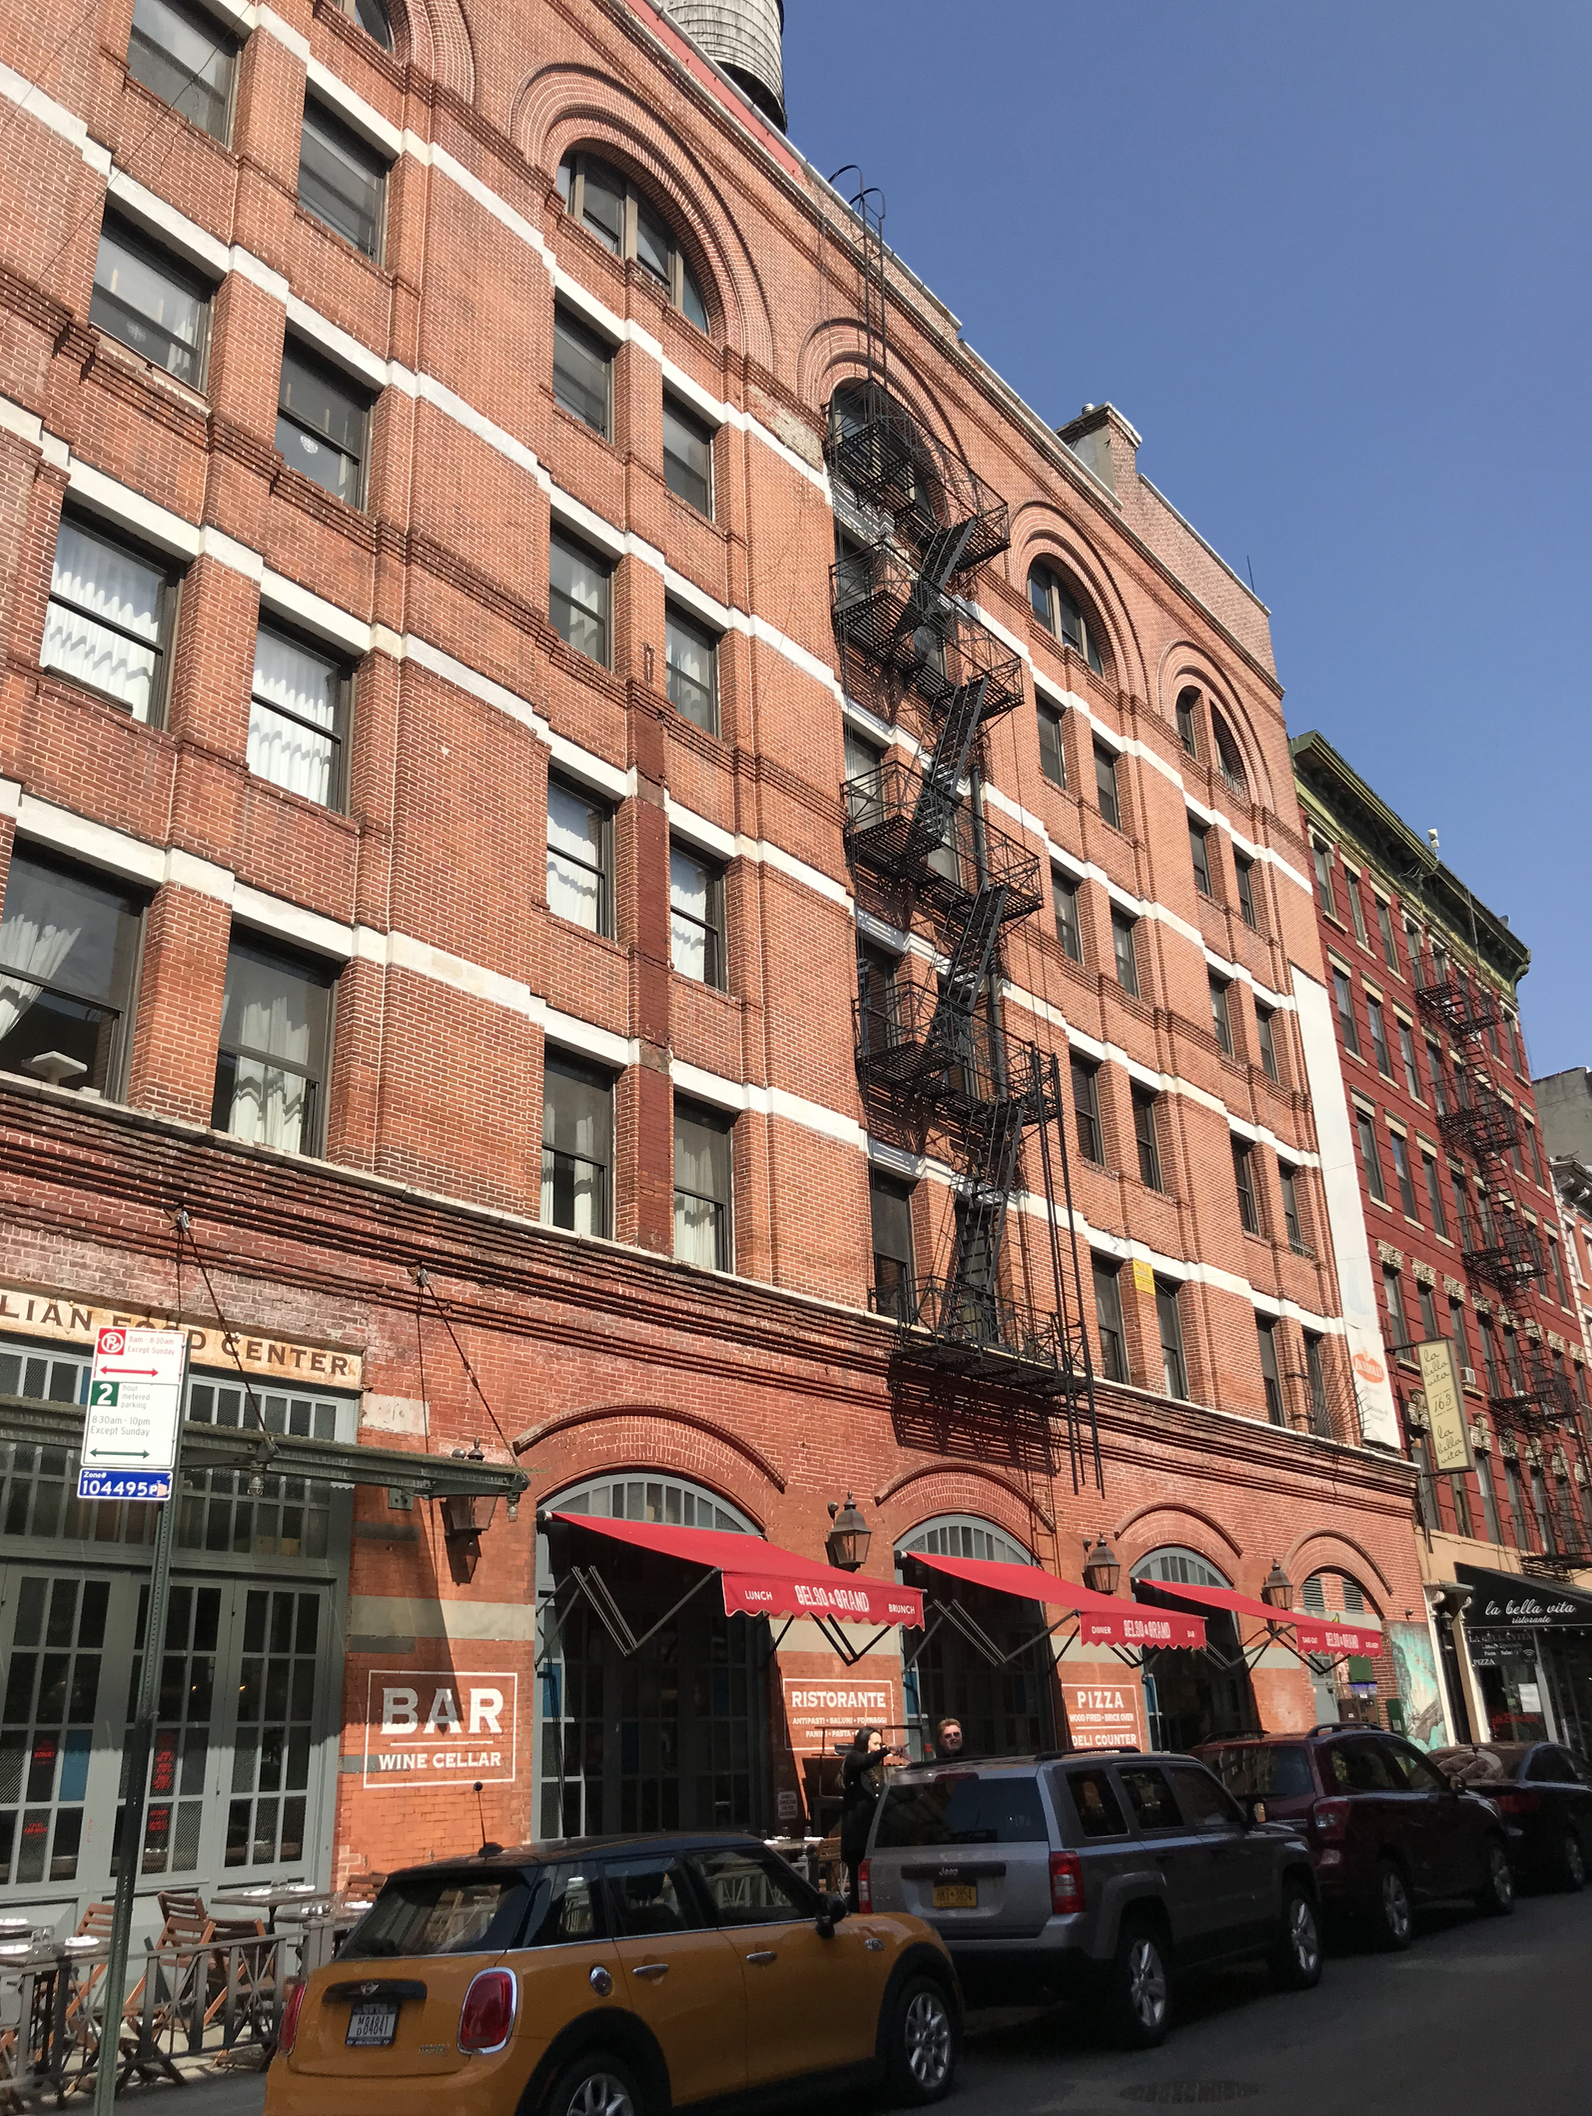 Brownstone beauties in New York City